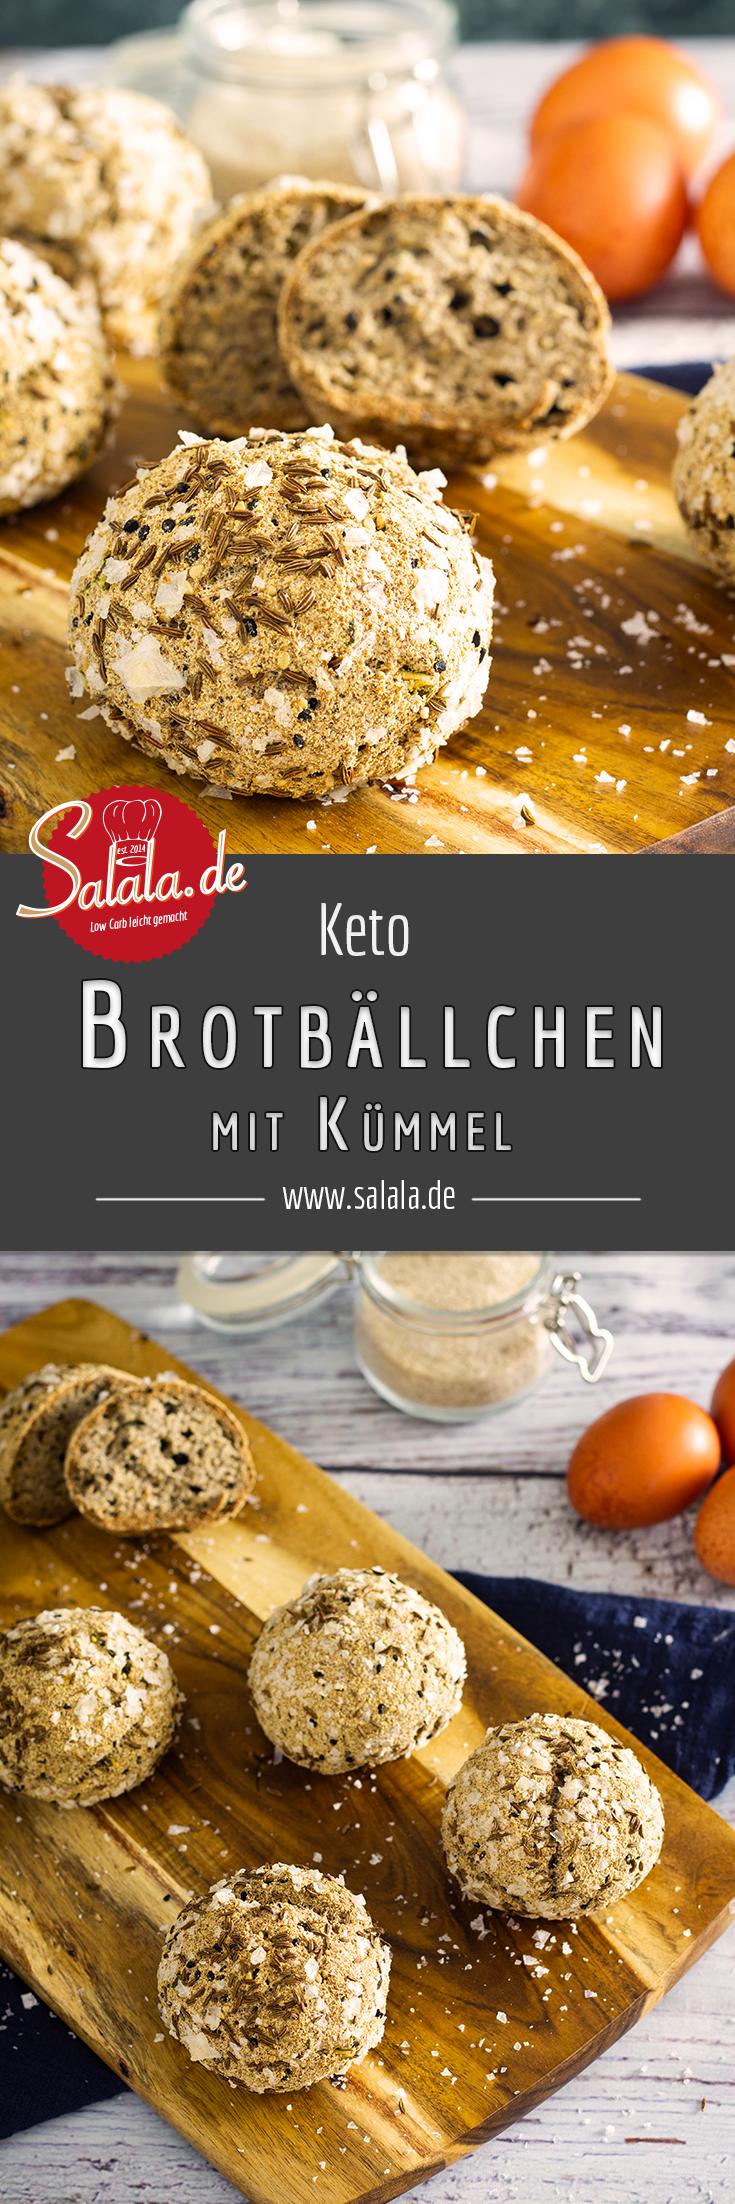 Würzige Keto-Brotbällchen | salala.de – Low Carb leicht gemacht